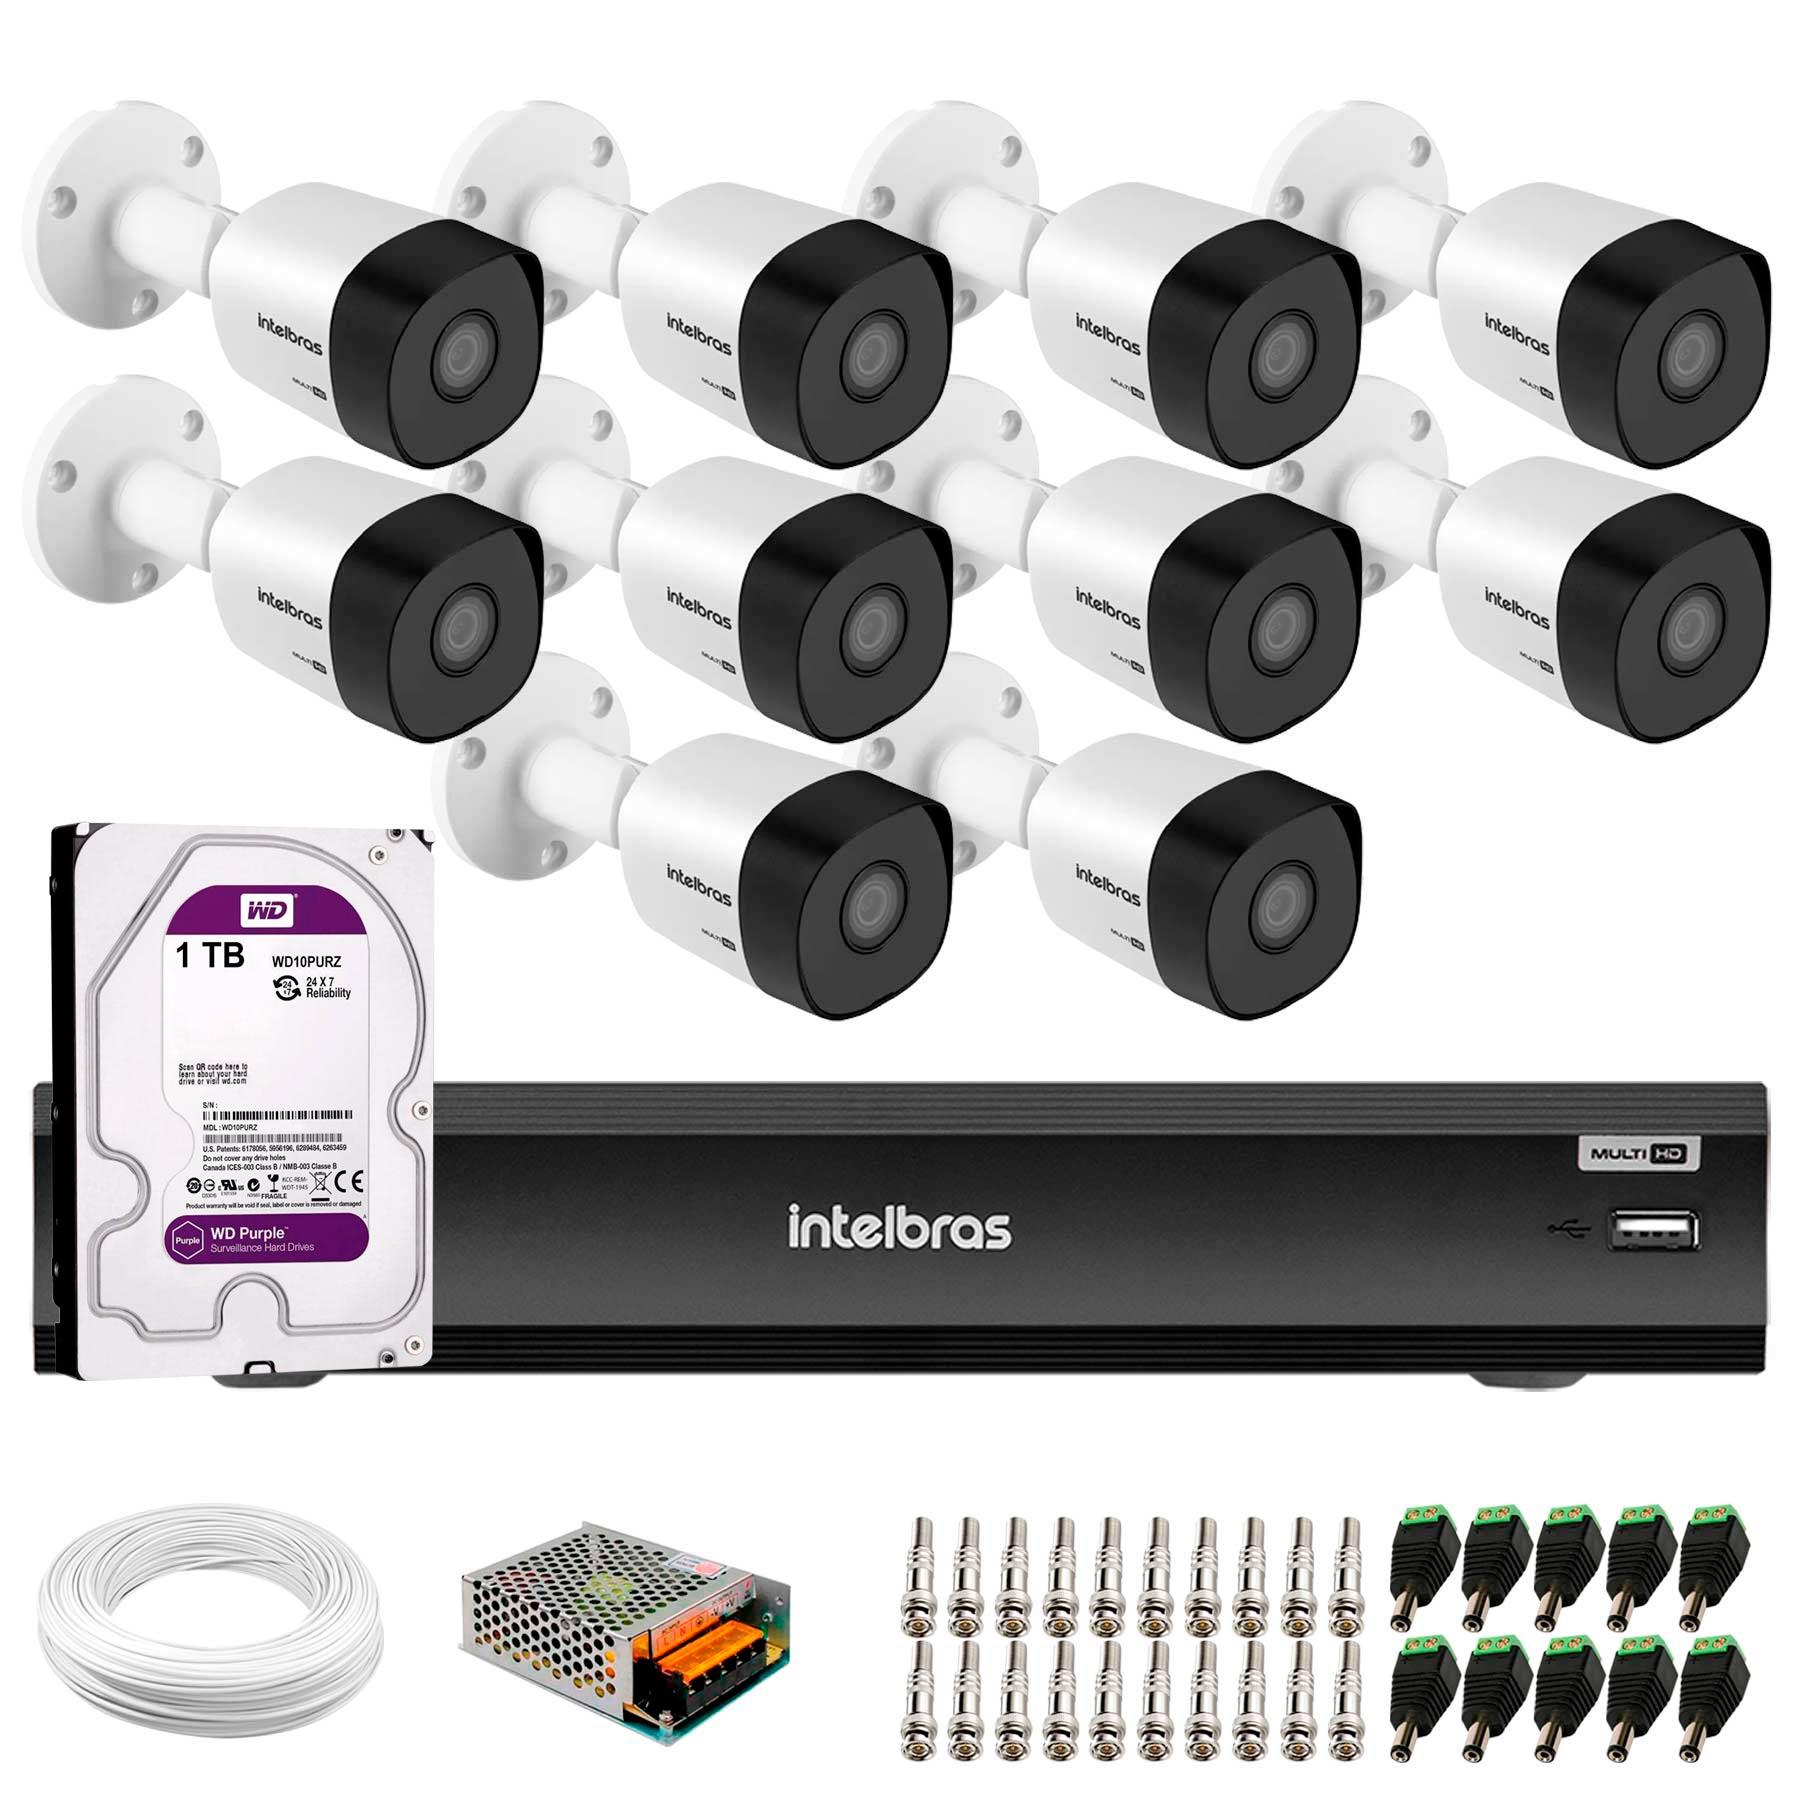 kit-10-cameras-de-seguranca-full-hd-1080p-vhd-3230-b-g5-dvr-intelbras-mhdx-3116-full-hd-de-16-canais-acessorios